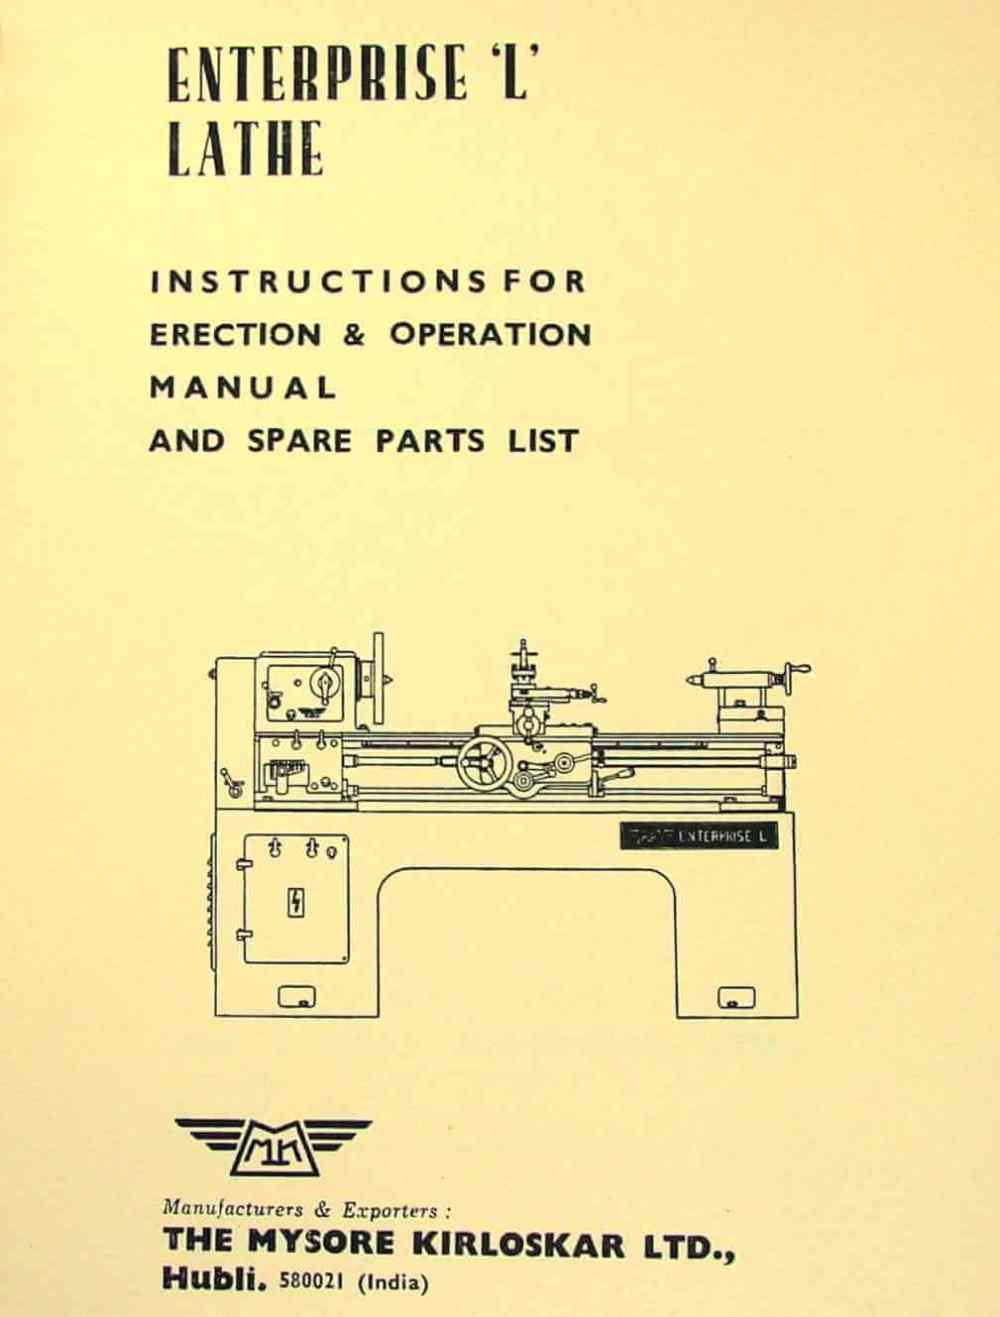 medium resolution of mysore kirloskar l1 l2 enterprise 15 lathe instructions and parts manual